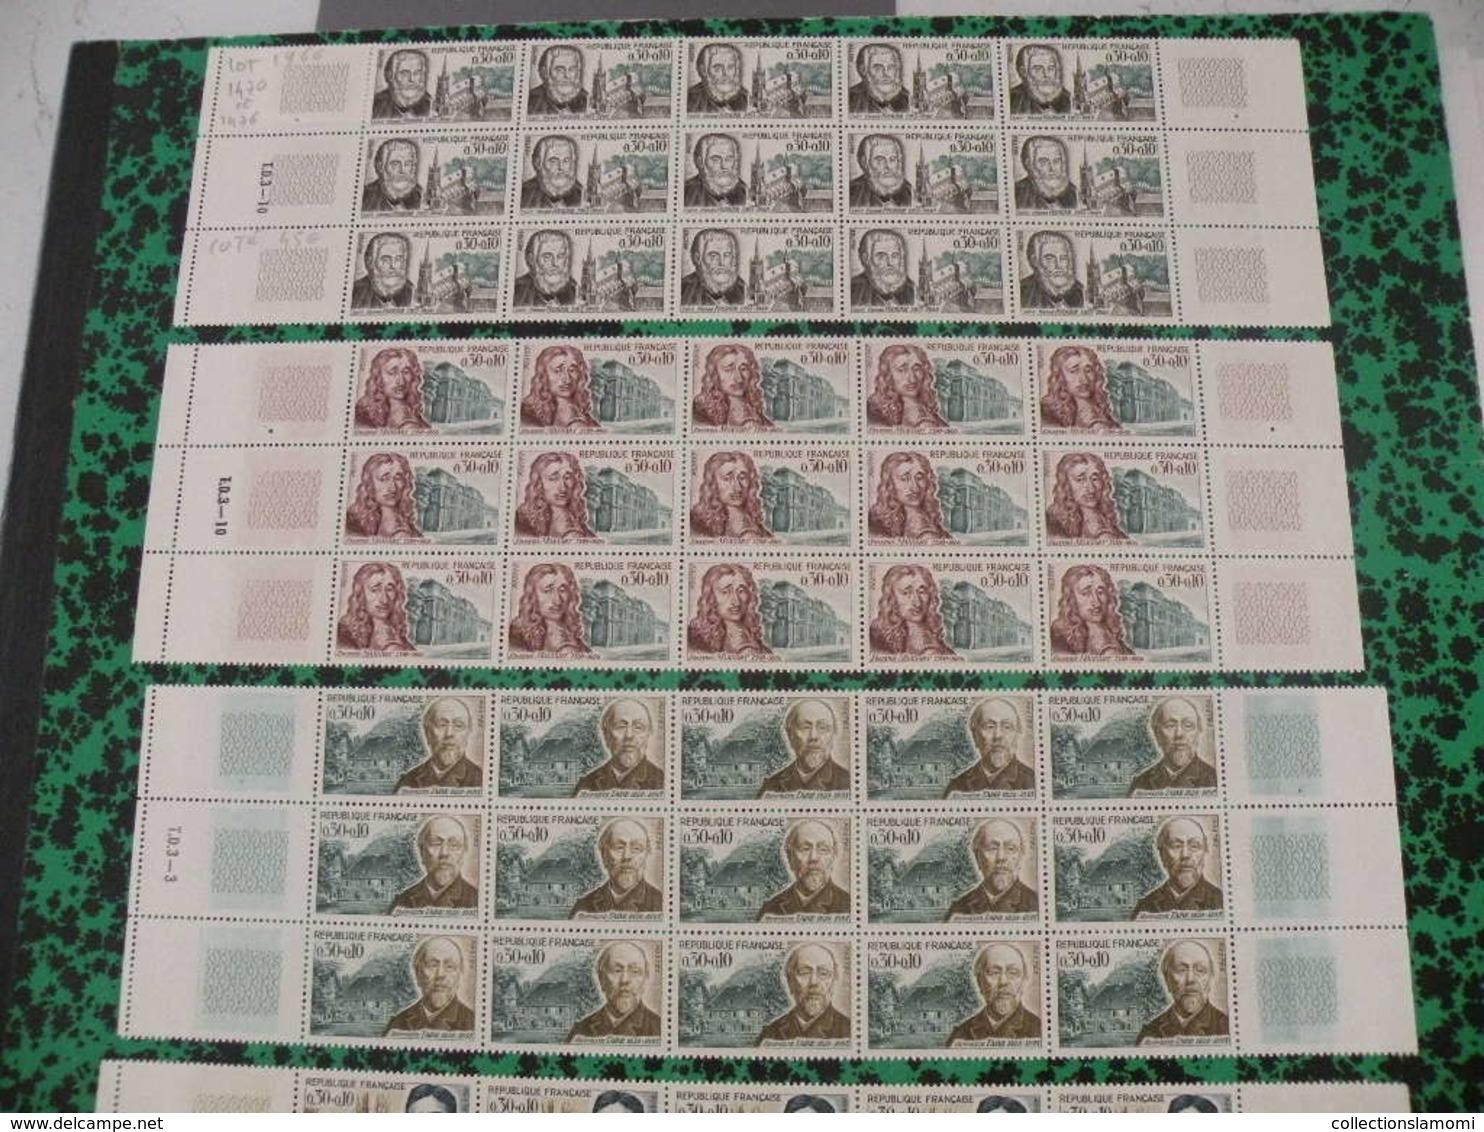 6 Bandes Neufs 1966 - S P Fournier,F Mansart,M Proust,G Faure,E Metchnickoff,H Taine - Coté 216€ Y&T N°1470 à 1475 - Collections